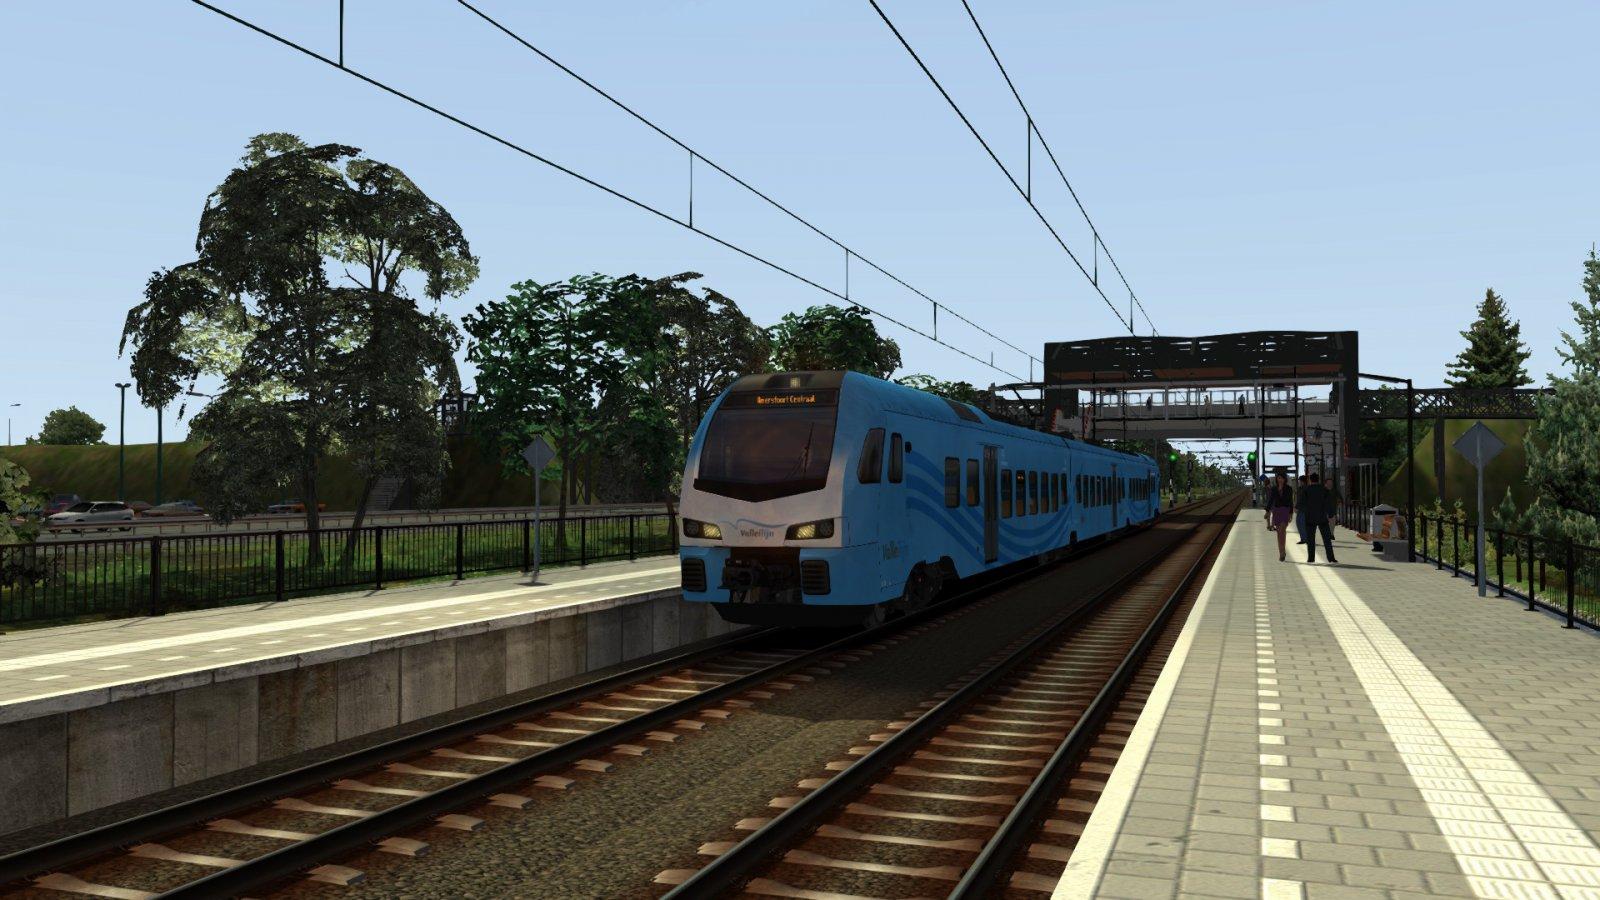 20201019200405_1.jpg - Train Simulator 2021 - SimTogether